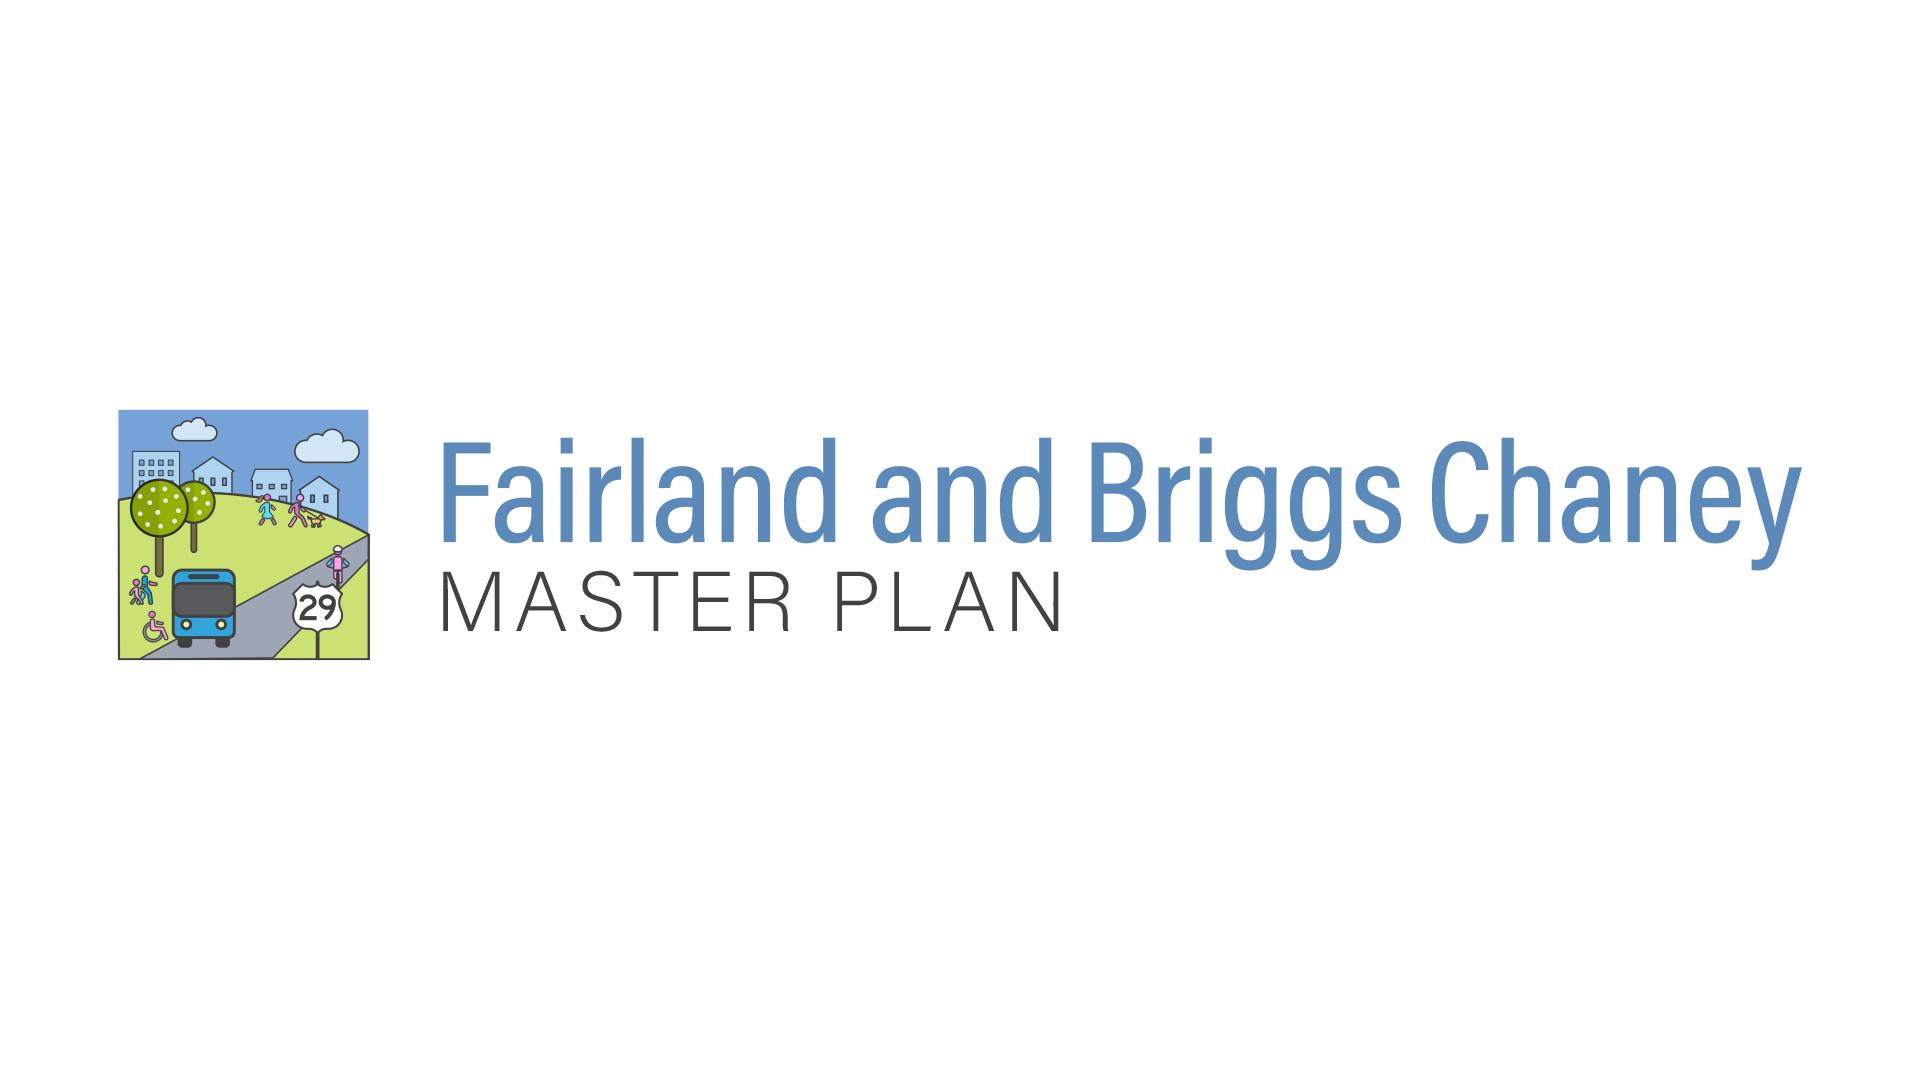 Fairland and Briggs Chaney logo